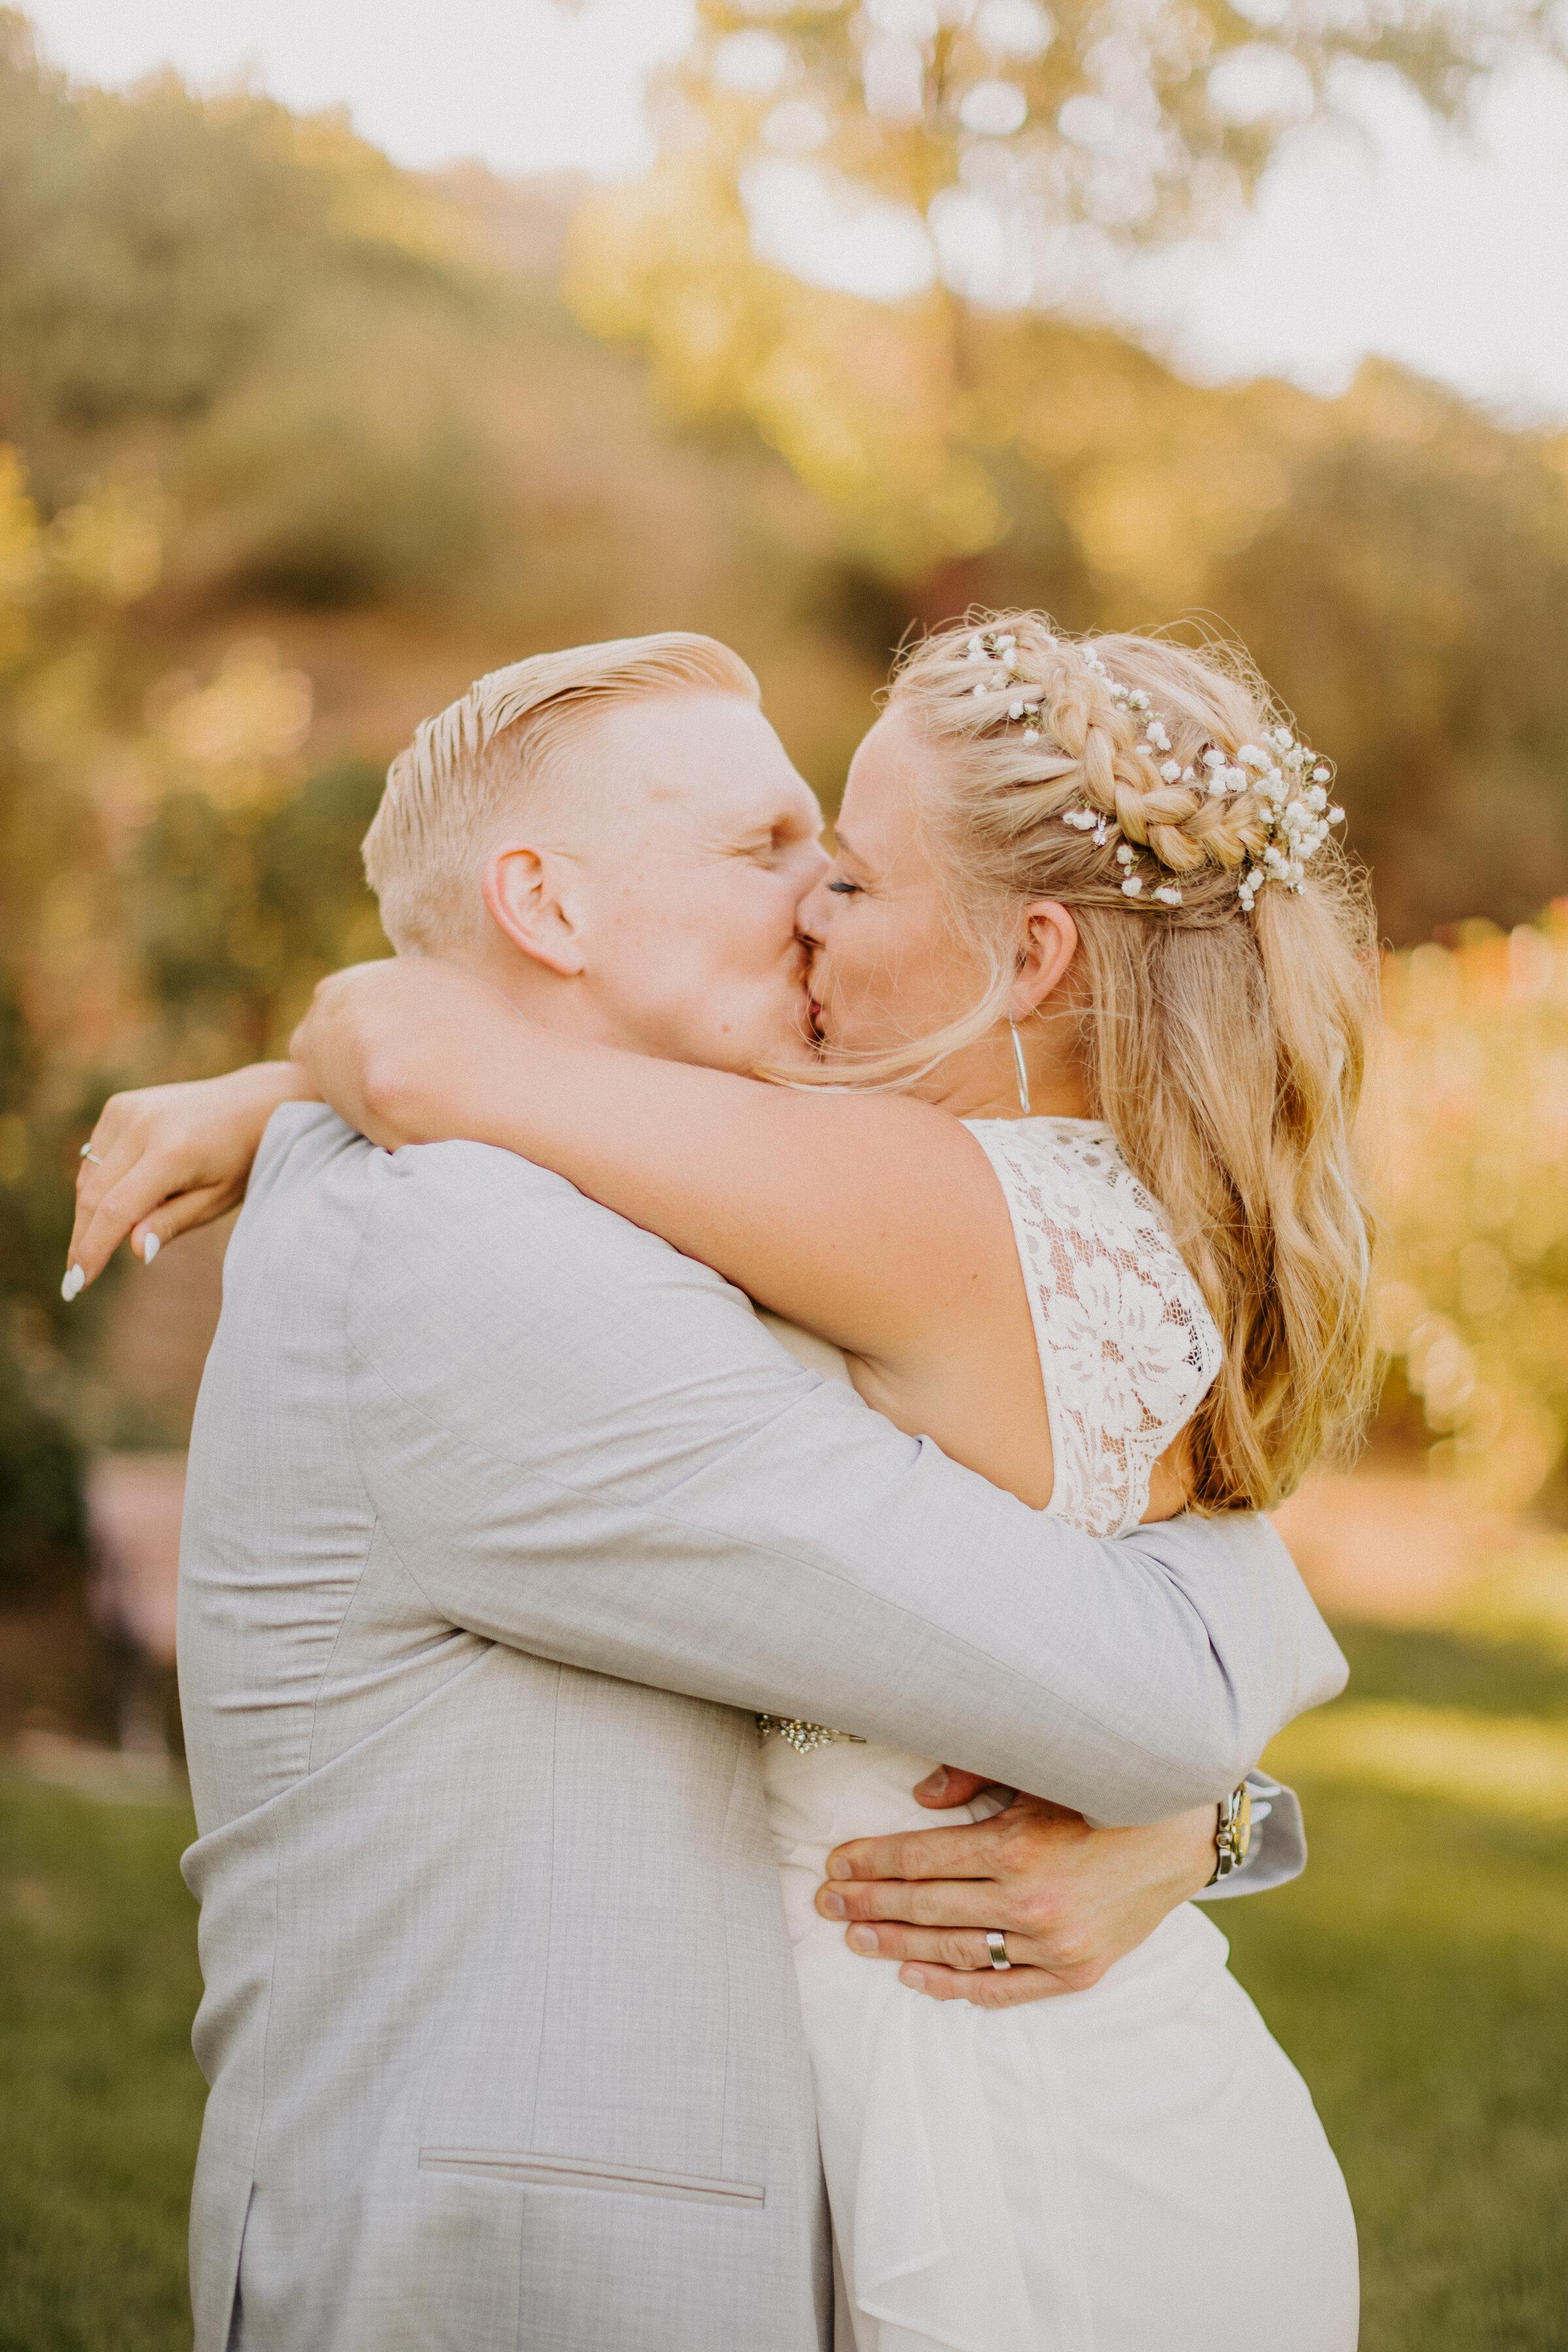 amphoto kj vowel renewal bridals-178.jpg